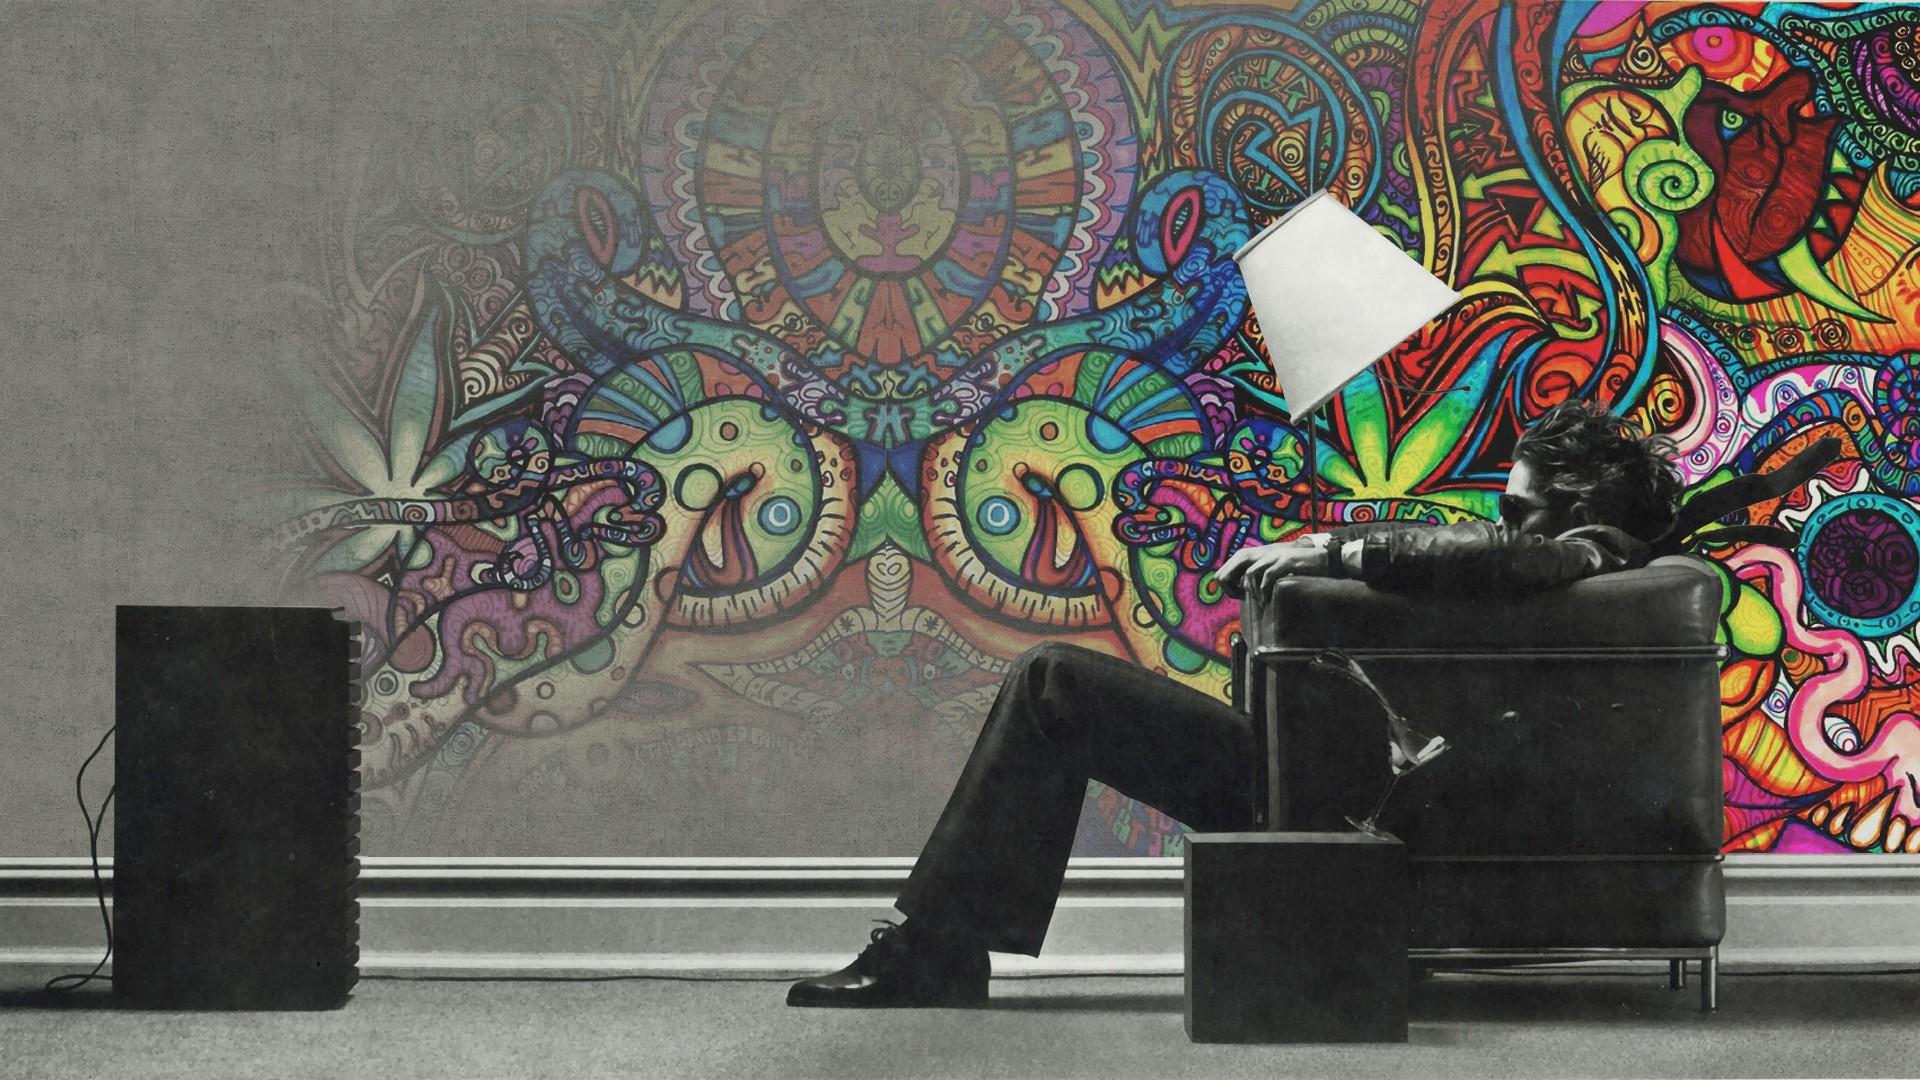 Fantastic Wallpaper Music Painting - painting-wall-music-green-orange-graffiti-street-art-mural-ART-color-design-modern-art-171645  Pictures_918485.jpg